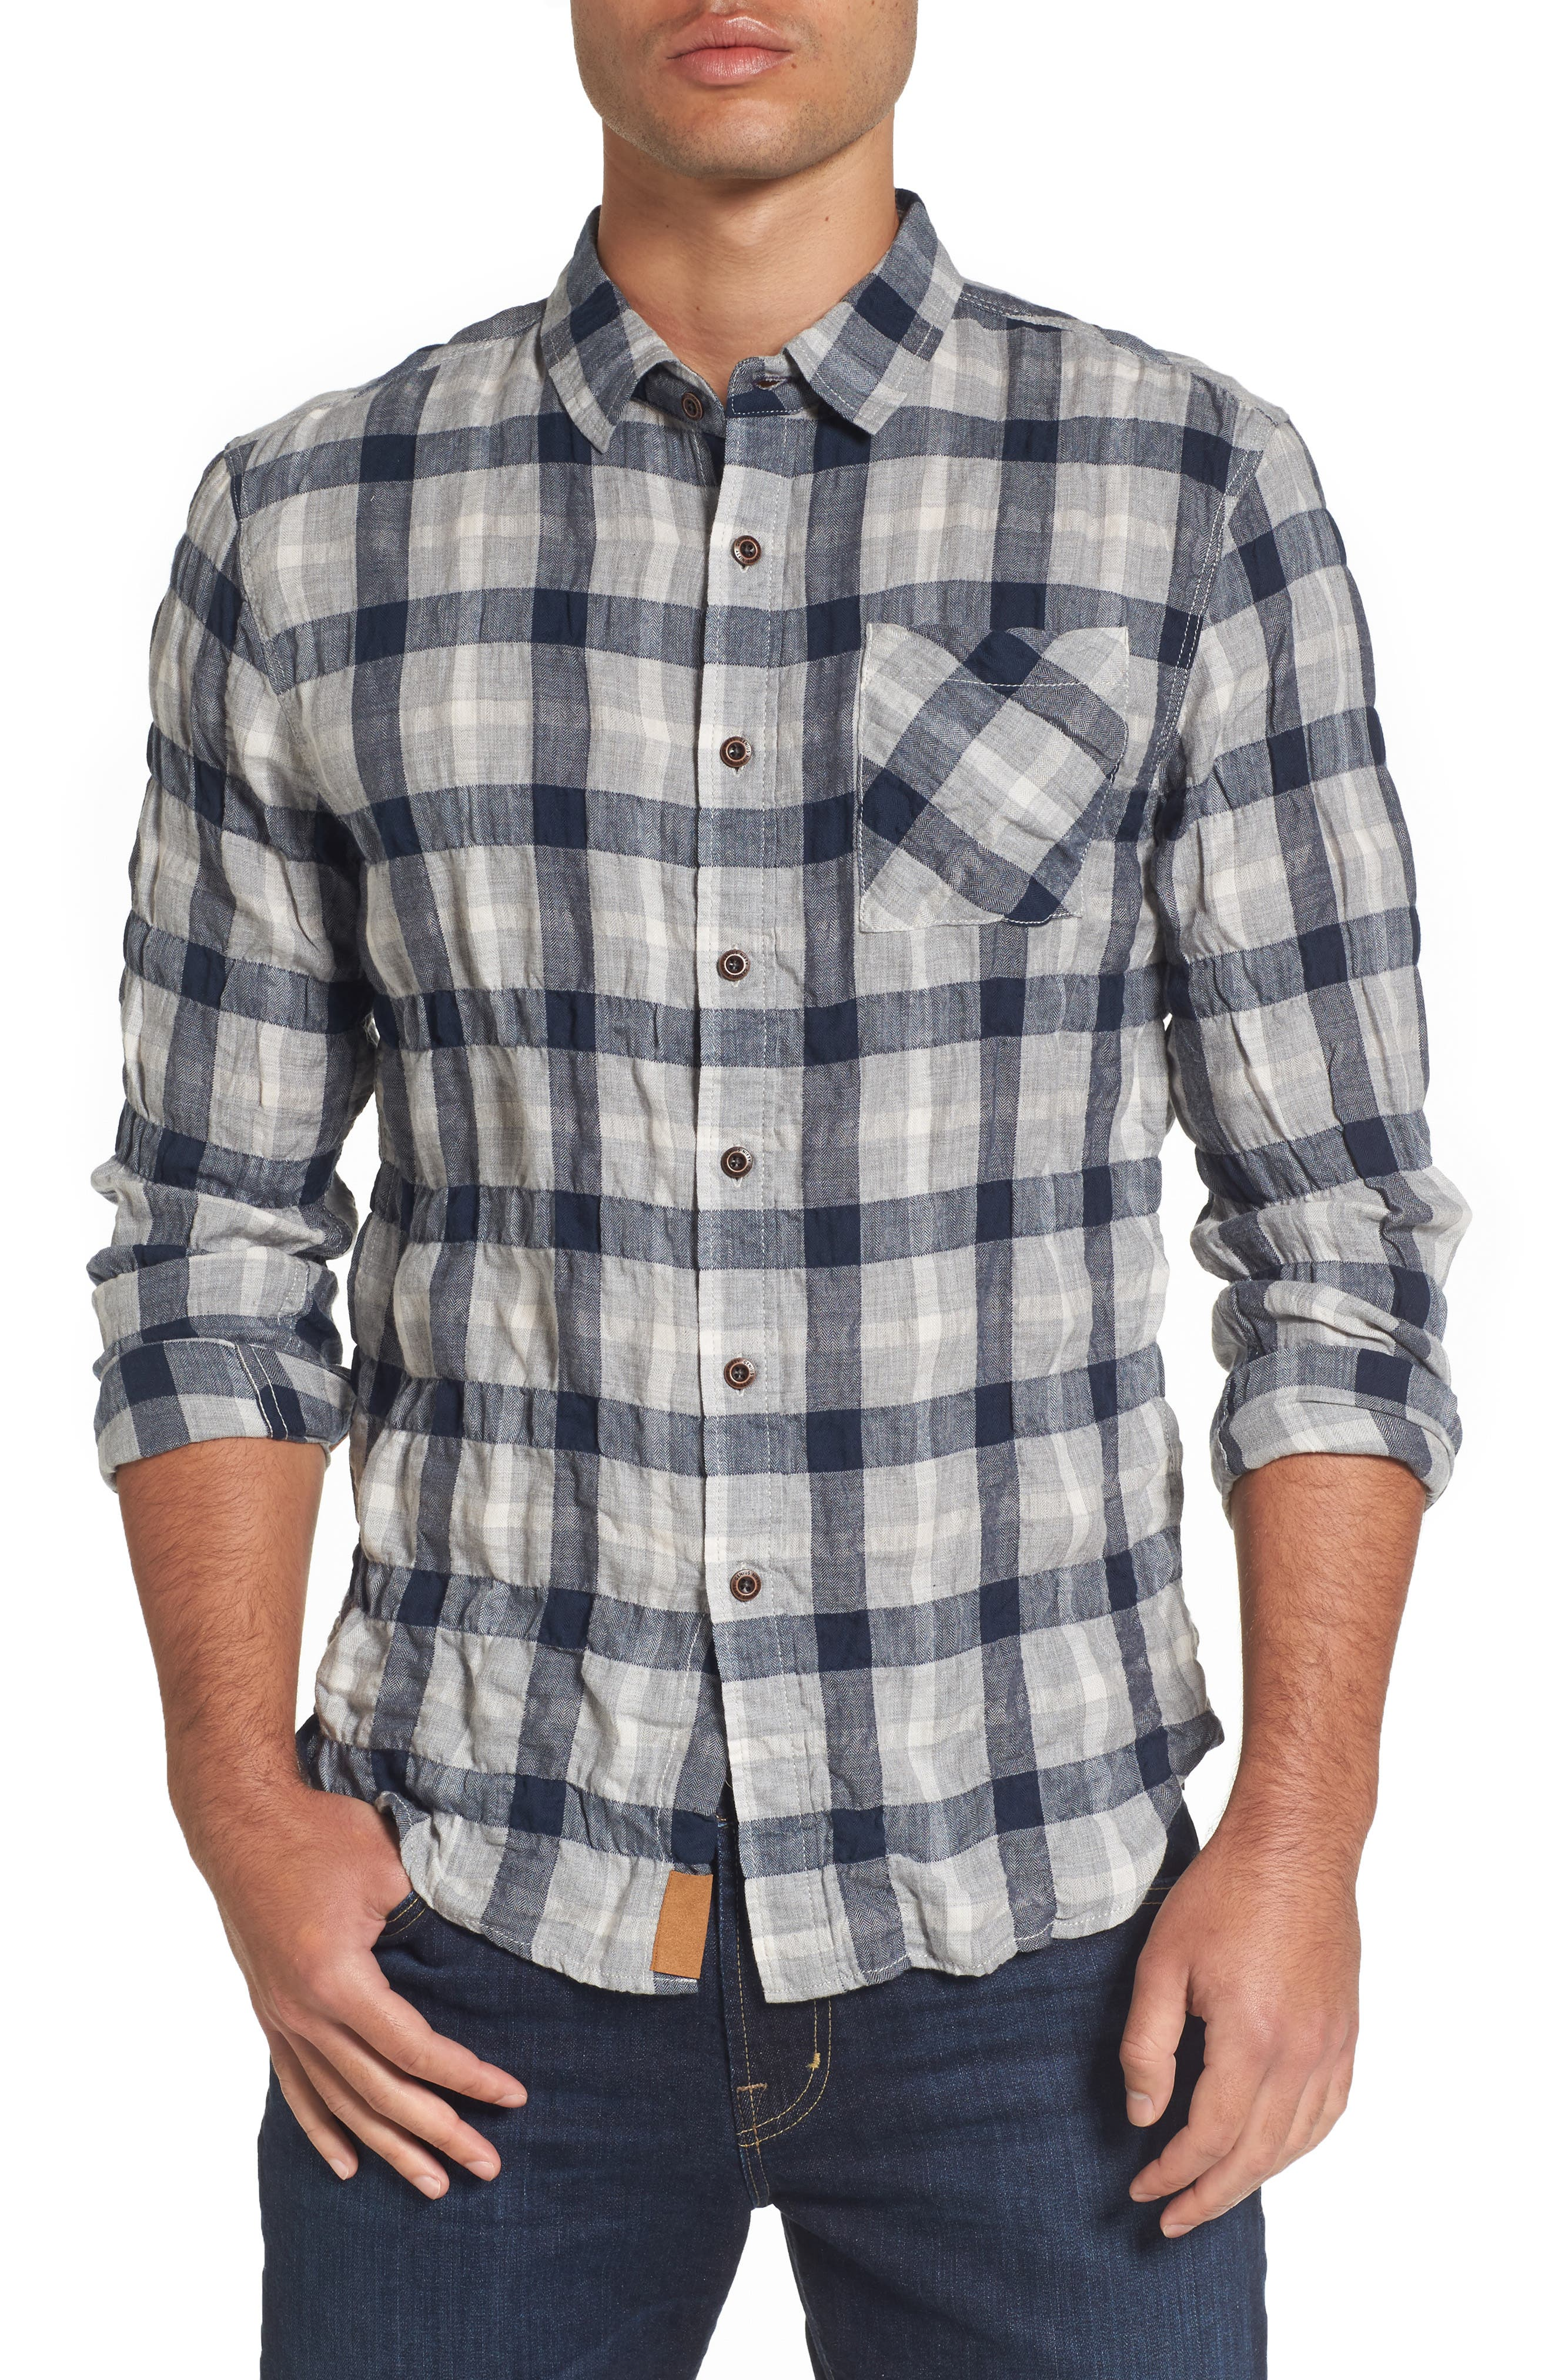 Truman Plaid Sport Shirt,                         Main,                         color, Gray/ Navy/ White